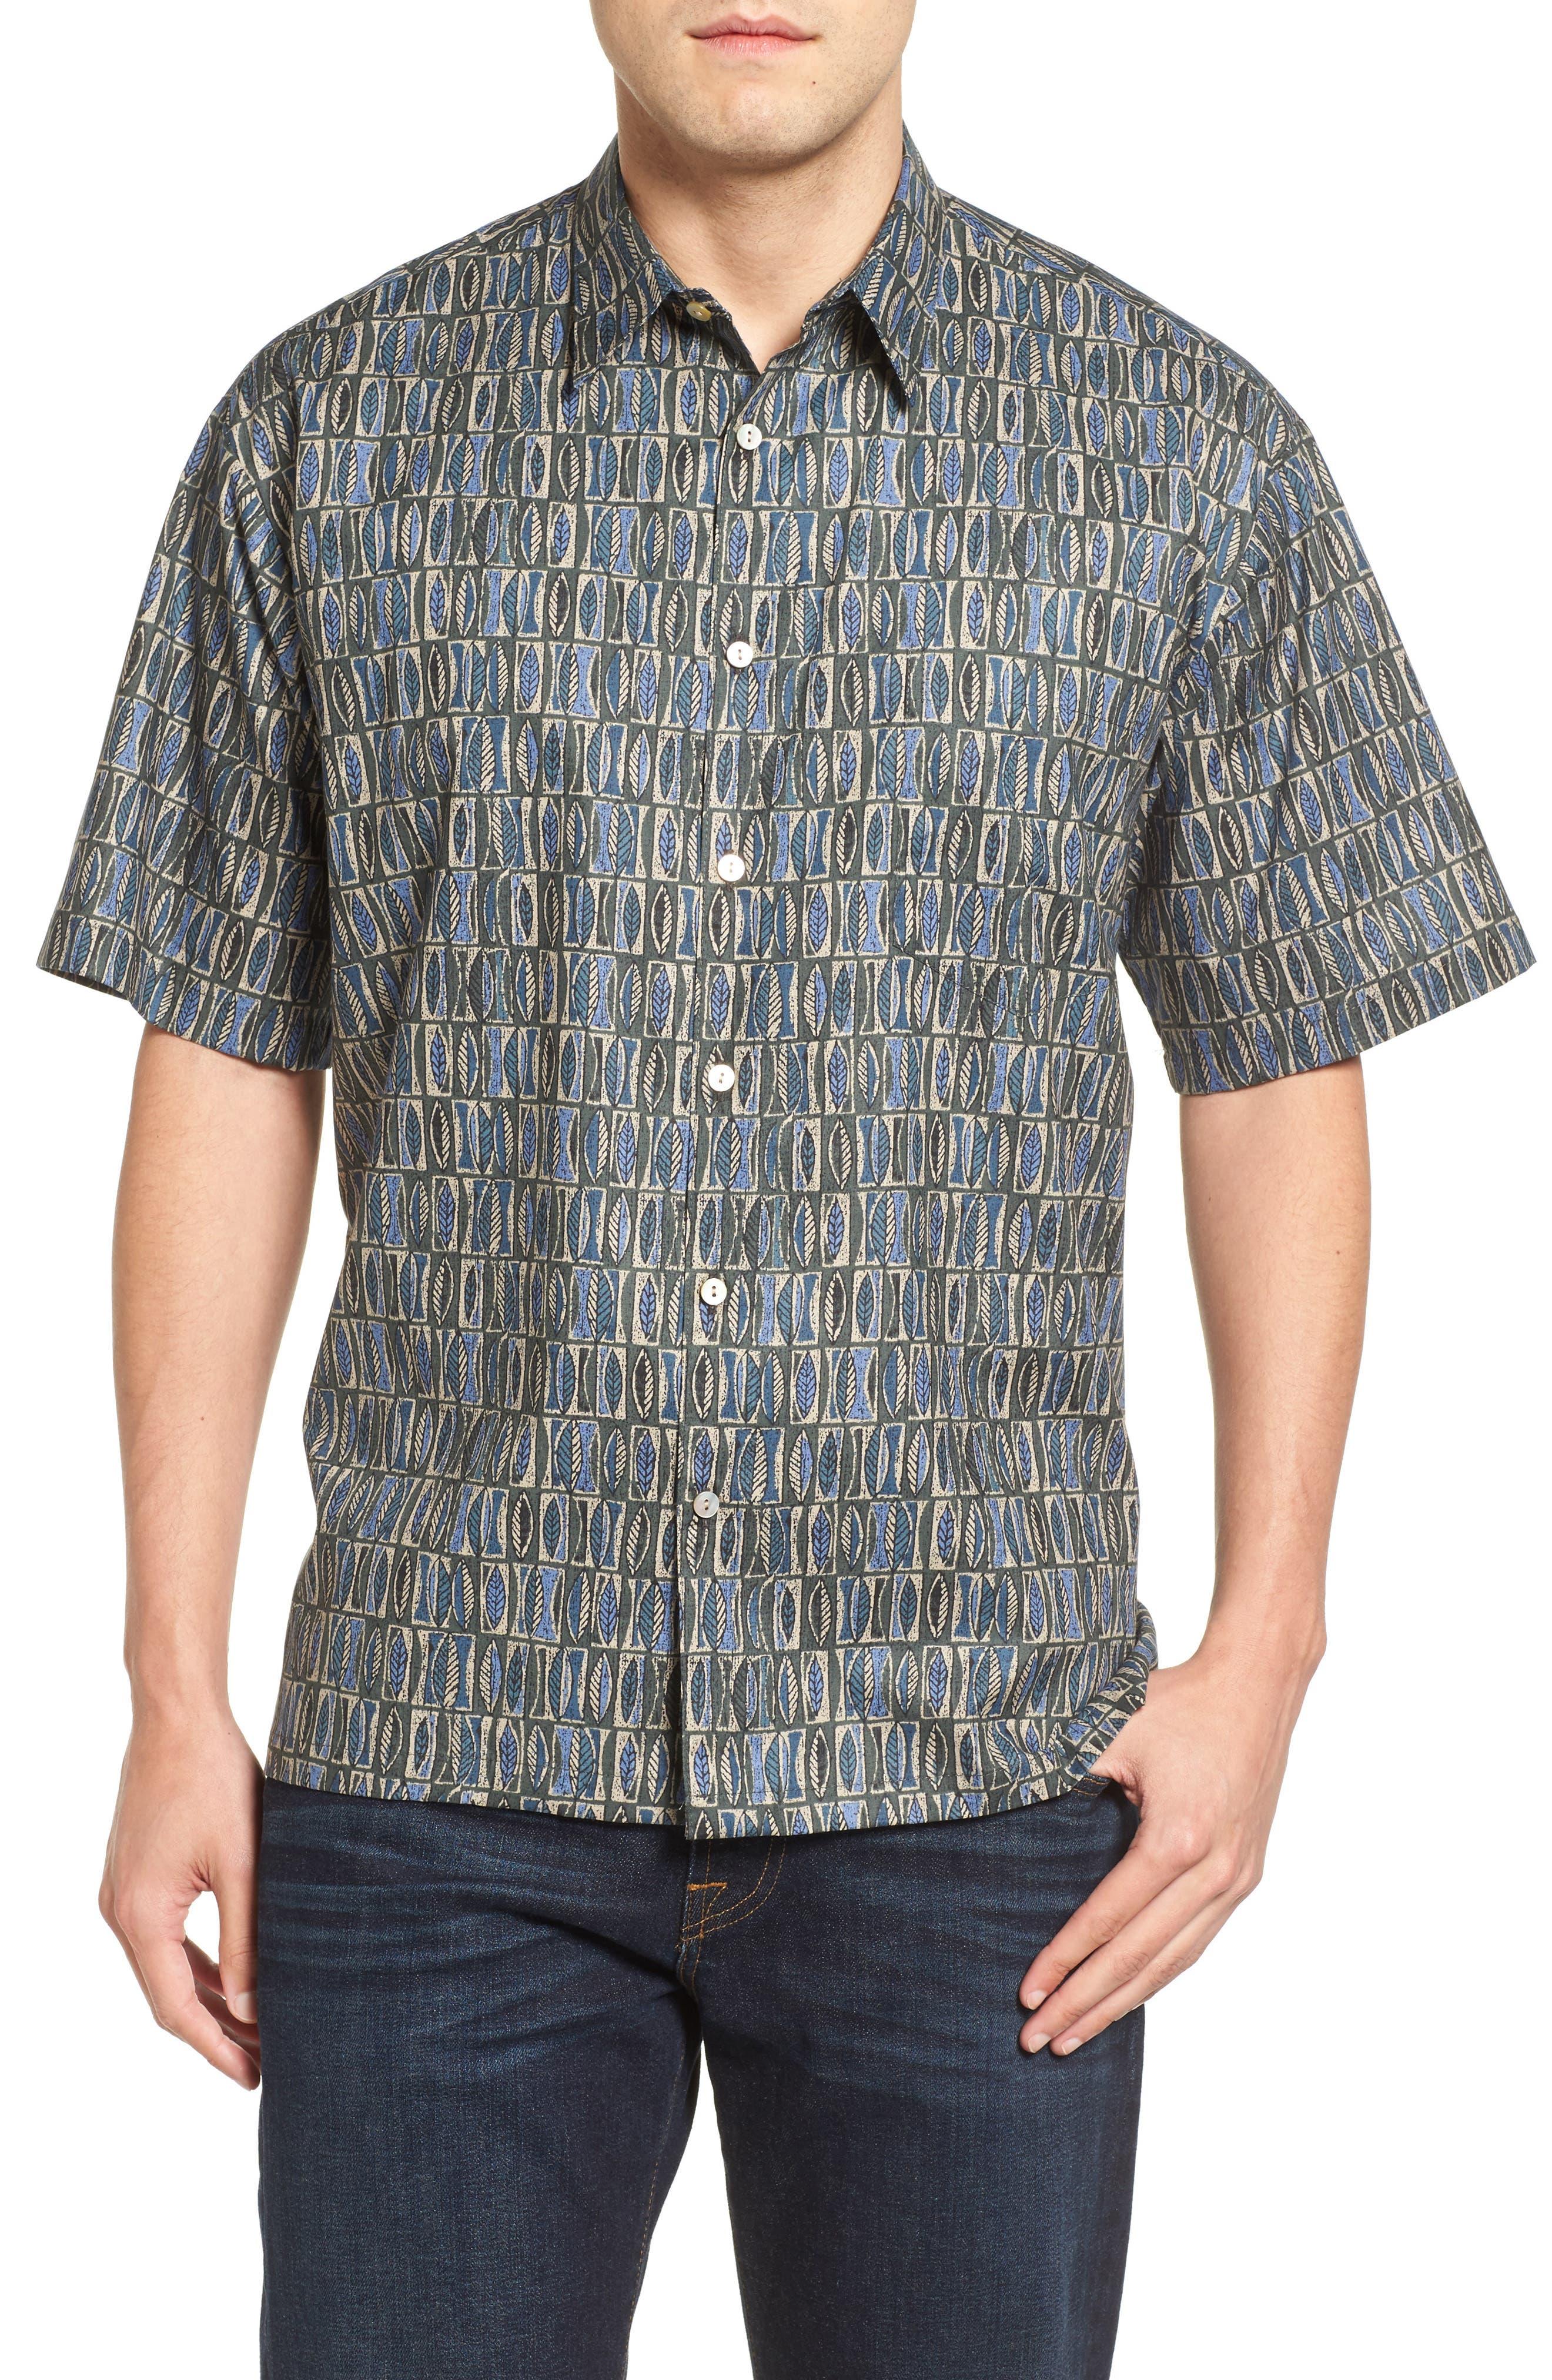 Tori Richard Perspectives Short Sleeve Classic Fit Sport Shirt